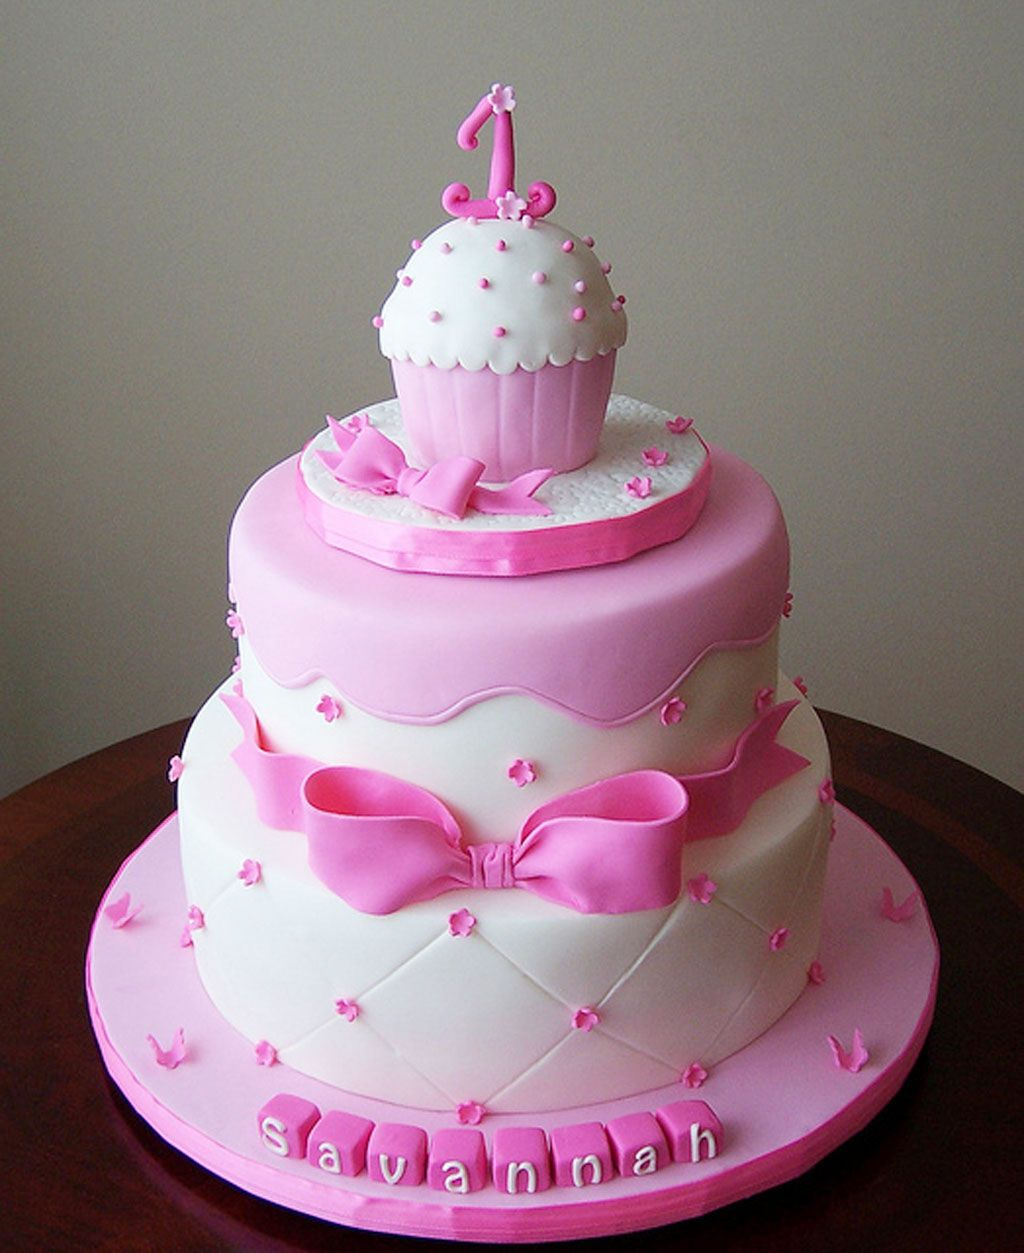 Princess Birthday Cakes For Girls Birthday Cakes For Girls